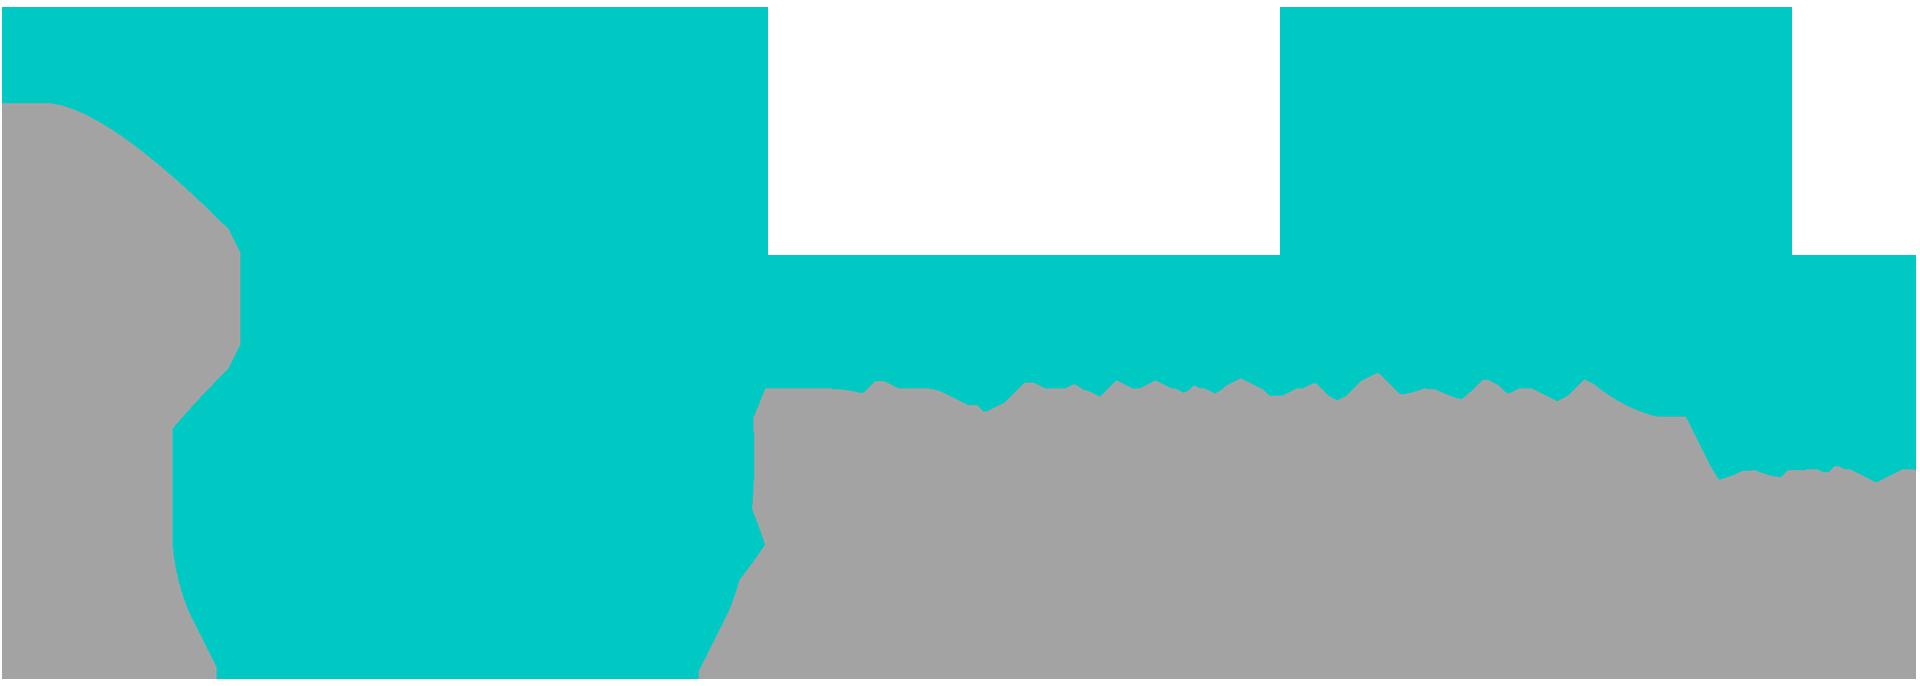 Hautarzt Köln | Dr. med. Reimann & Dr. med. Brögelmann